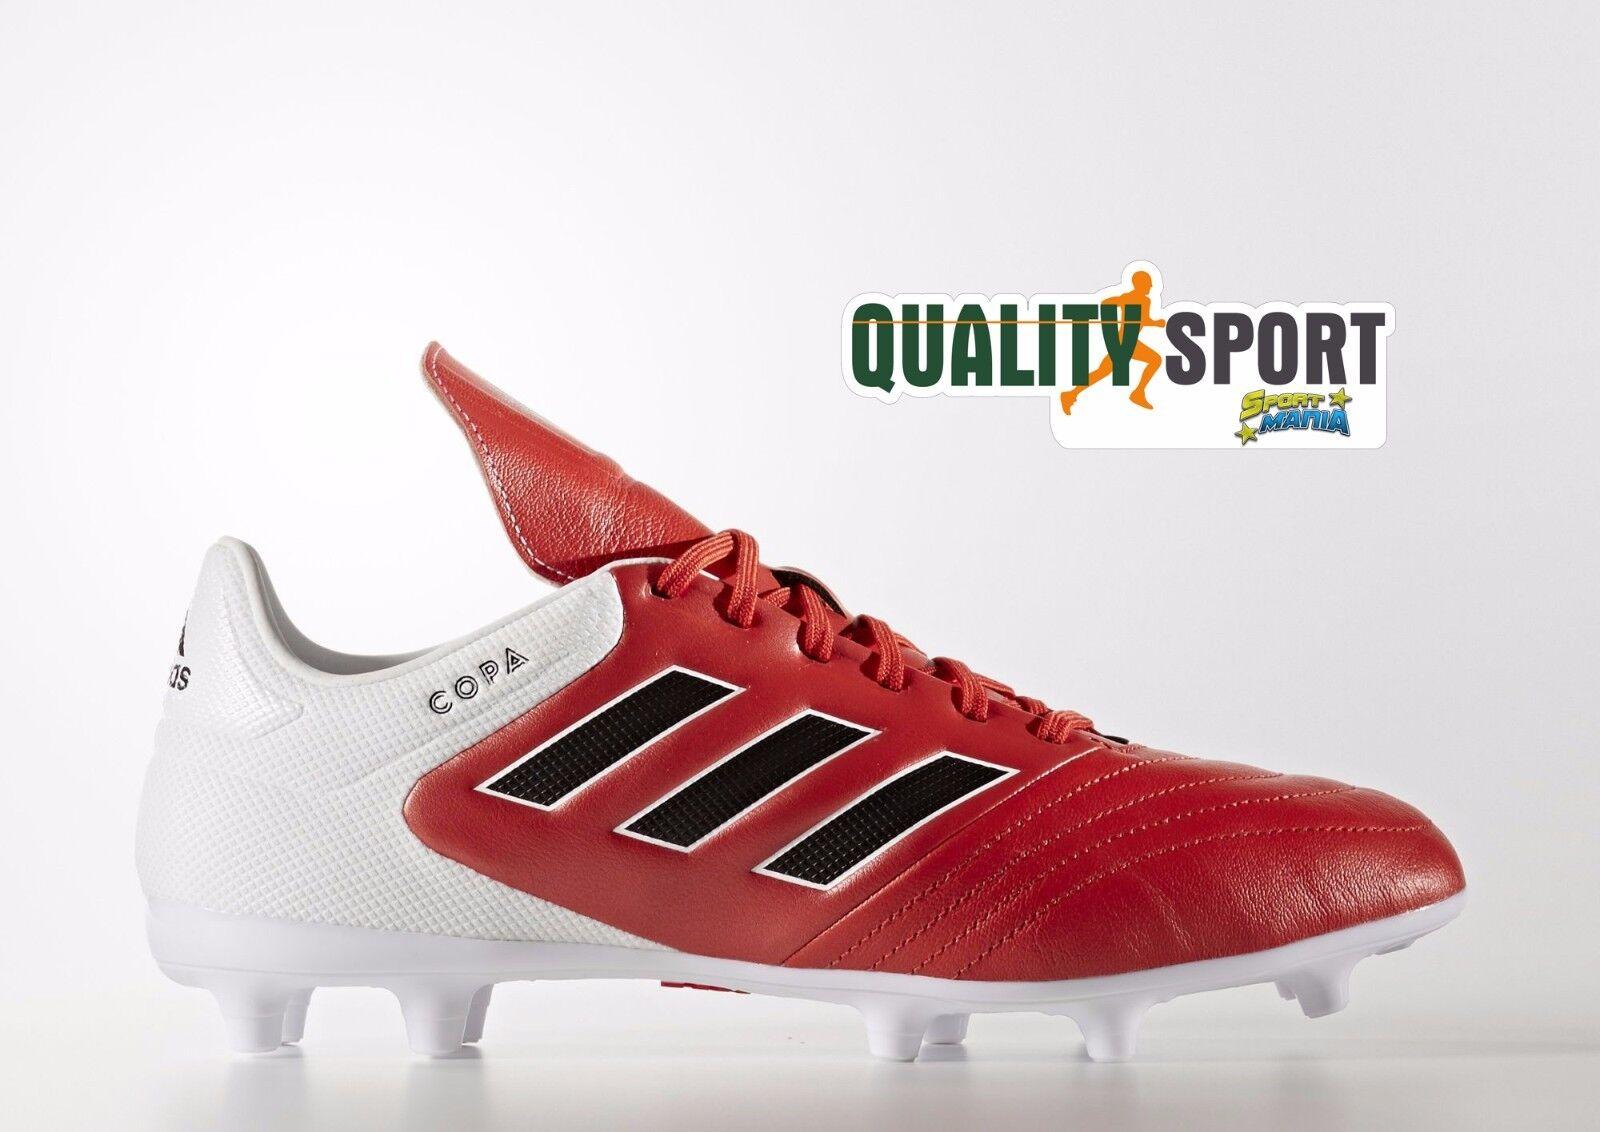 Adidas Copa 17.3 FG red Bianco shoes men Sportive Calcio BB3555